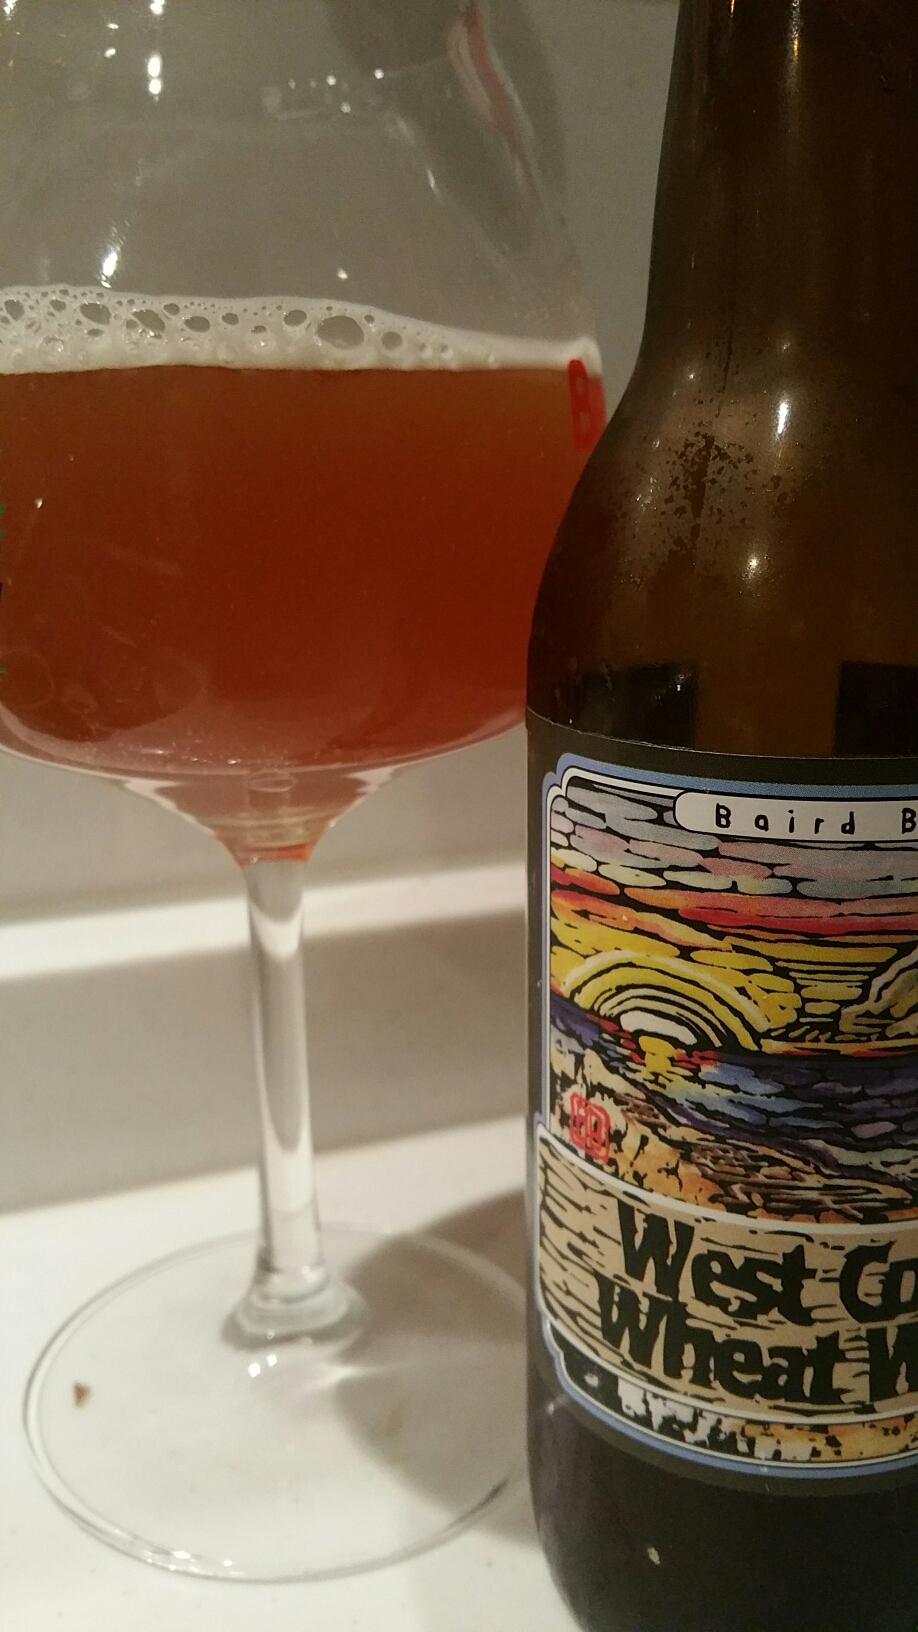 Baird West Coast Wheat Wine